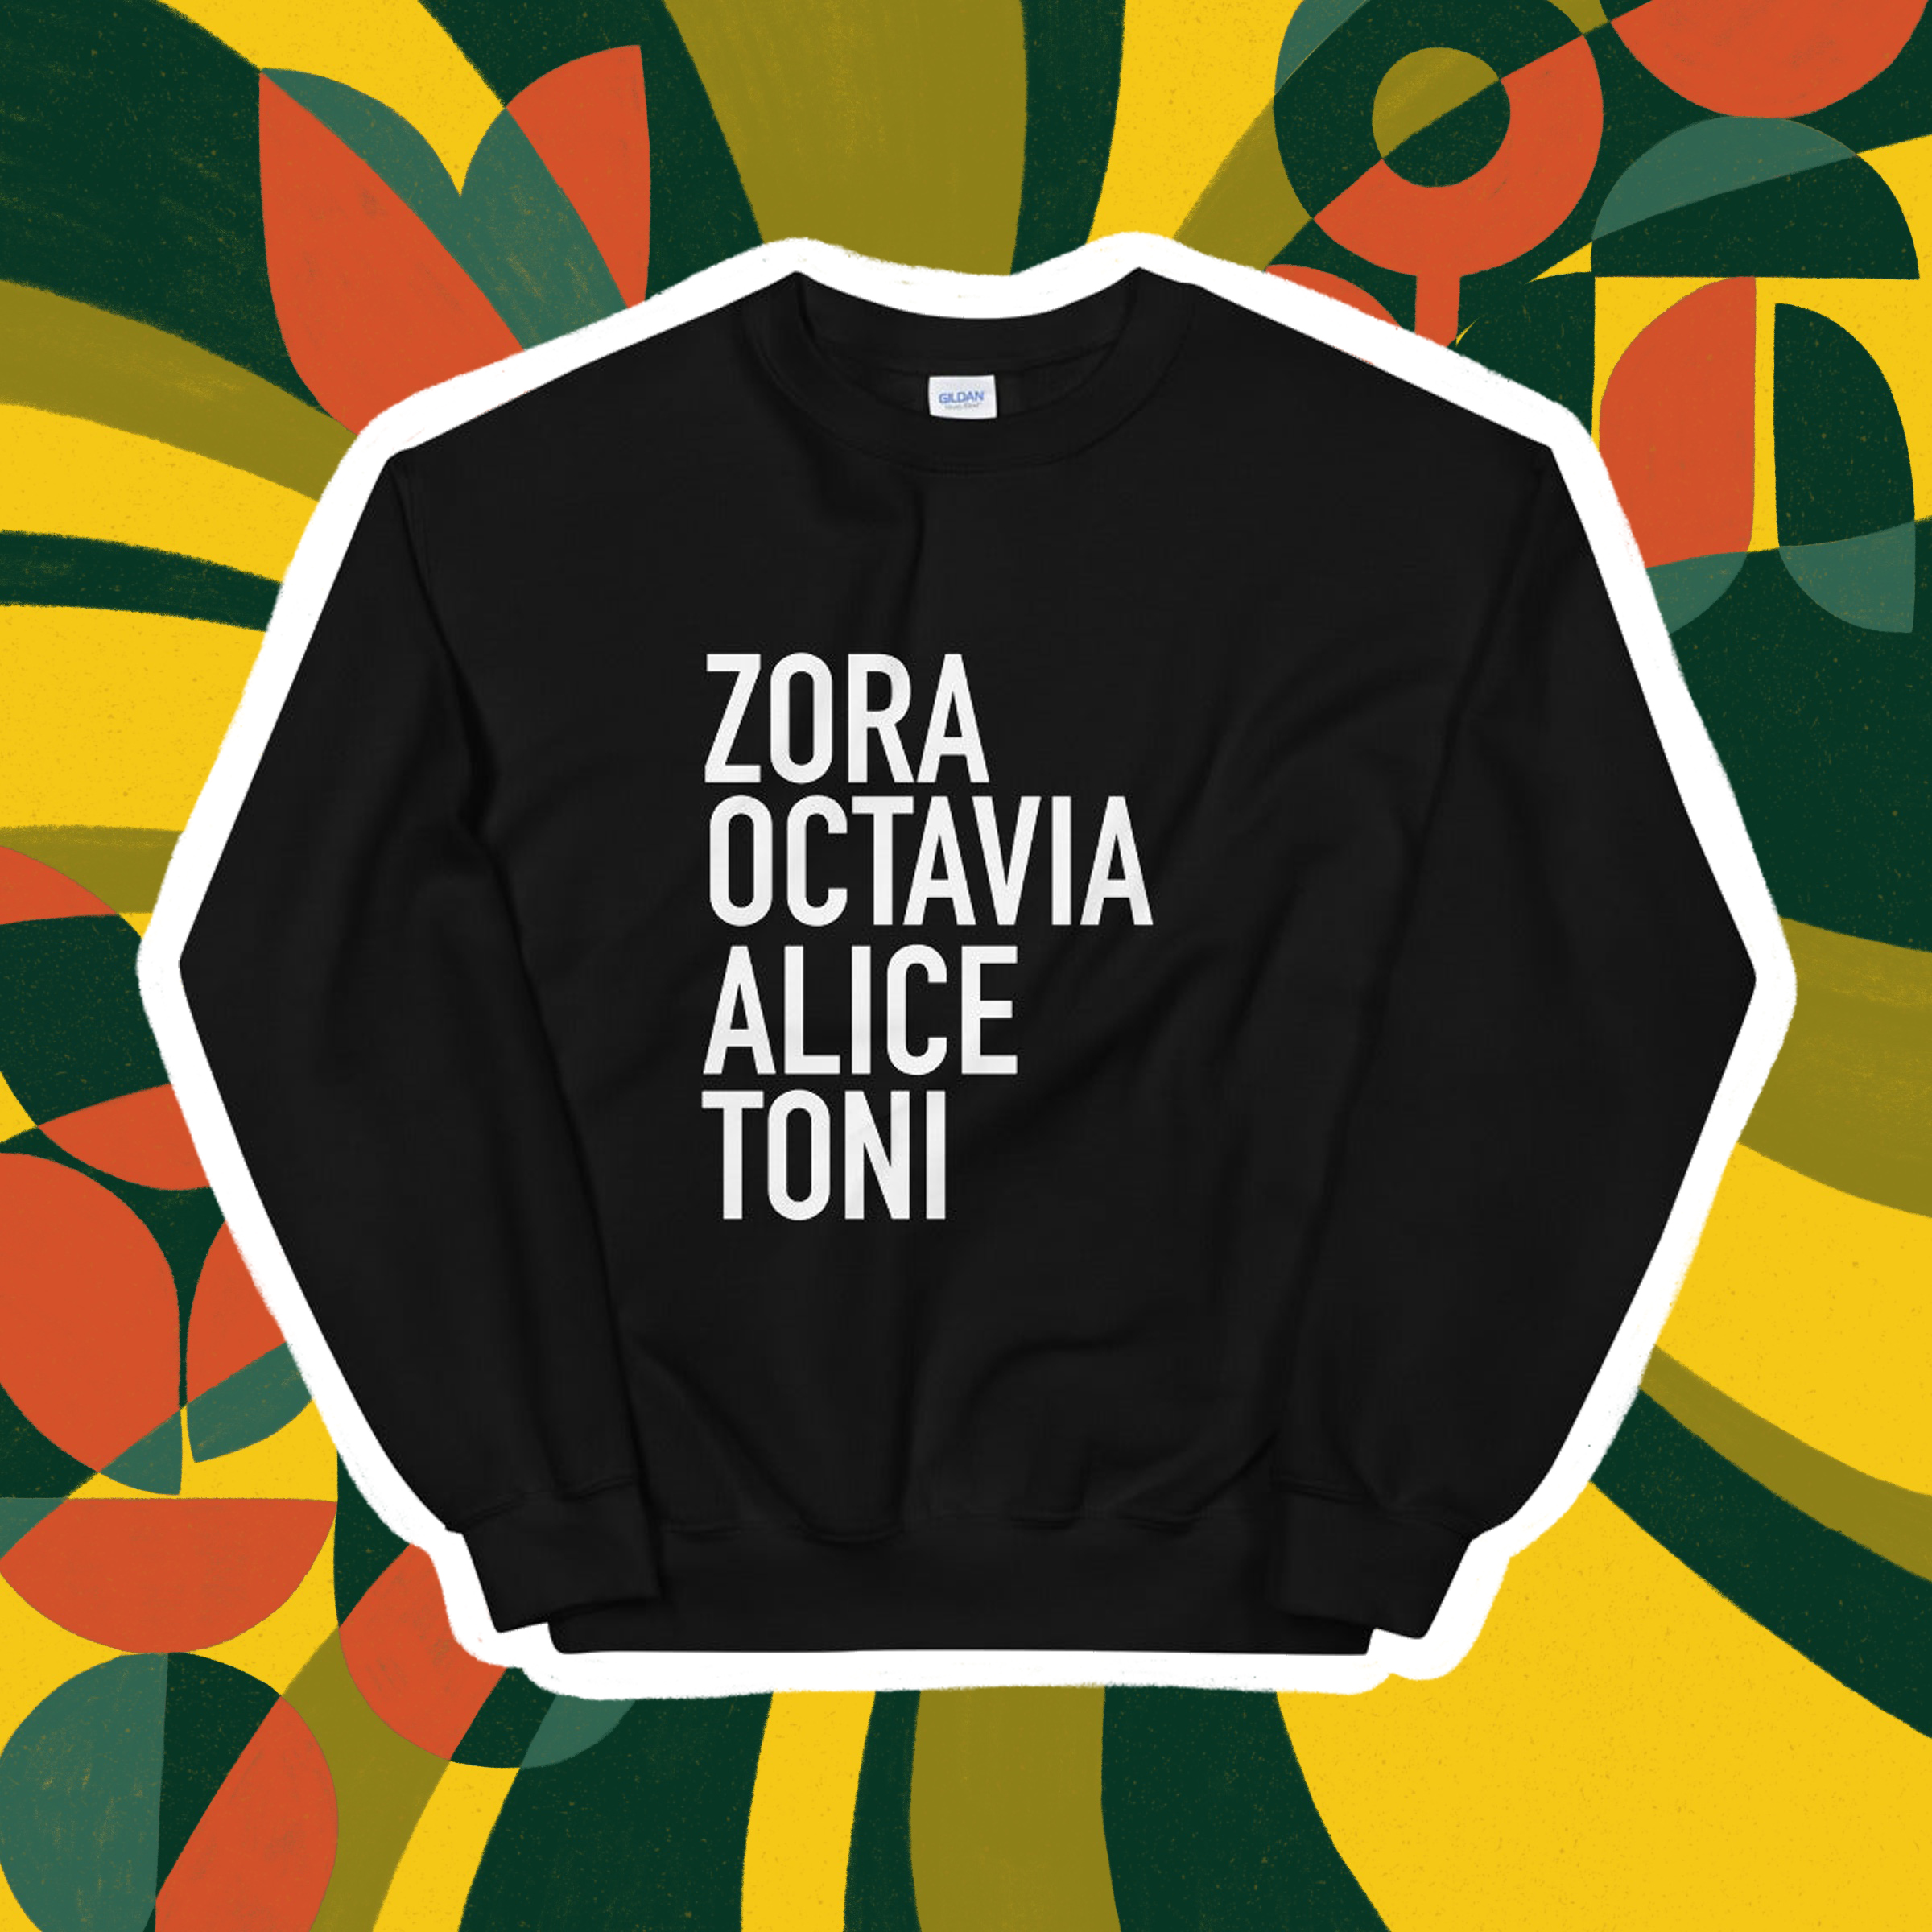 Zora, Octavia, Alice, Toni sweatshirt